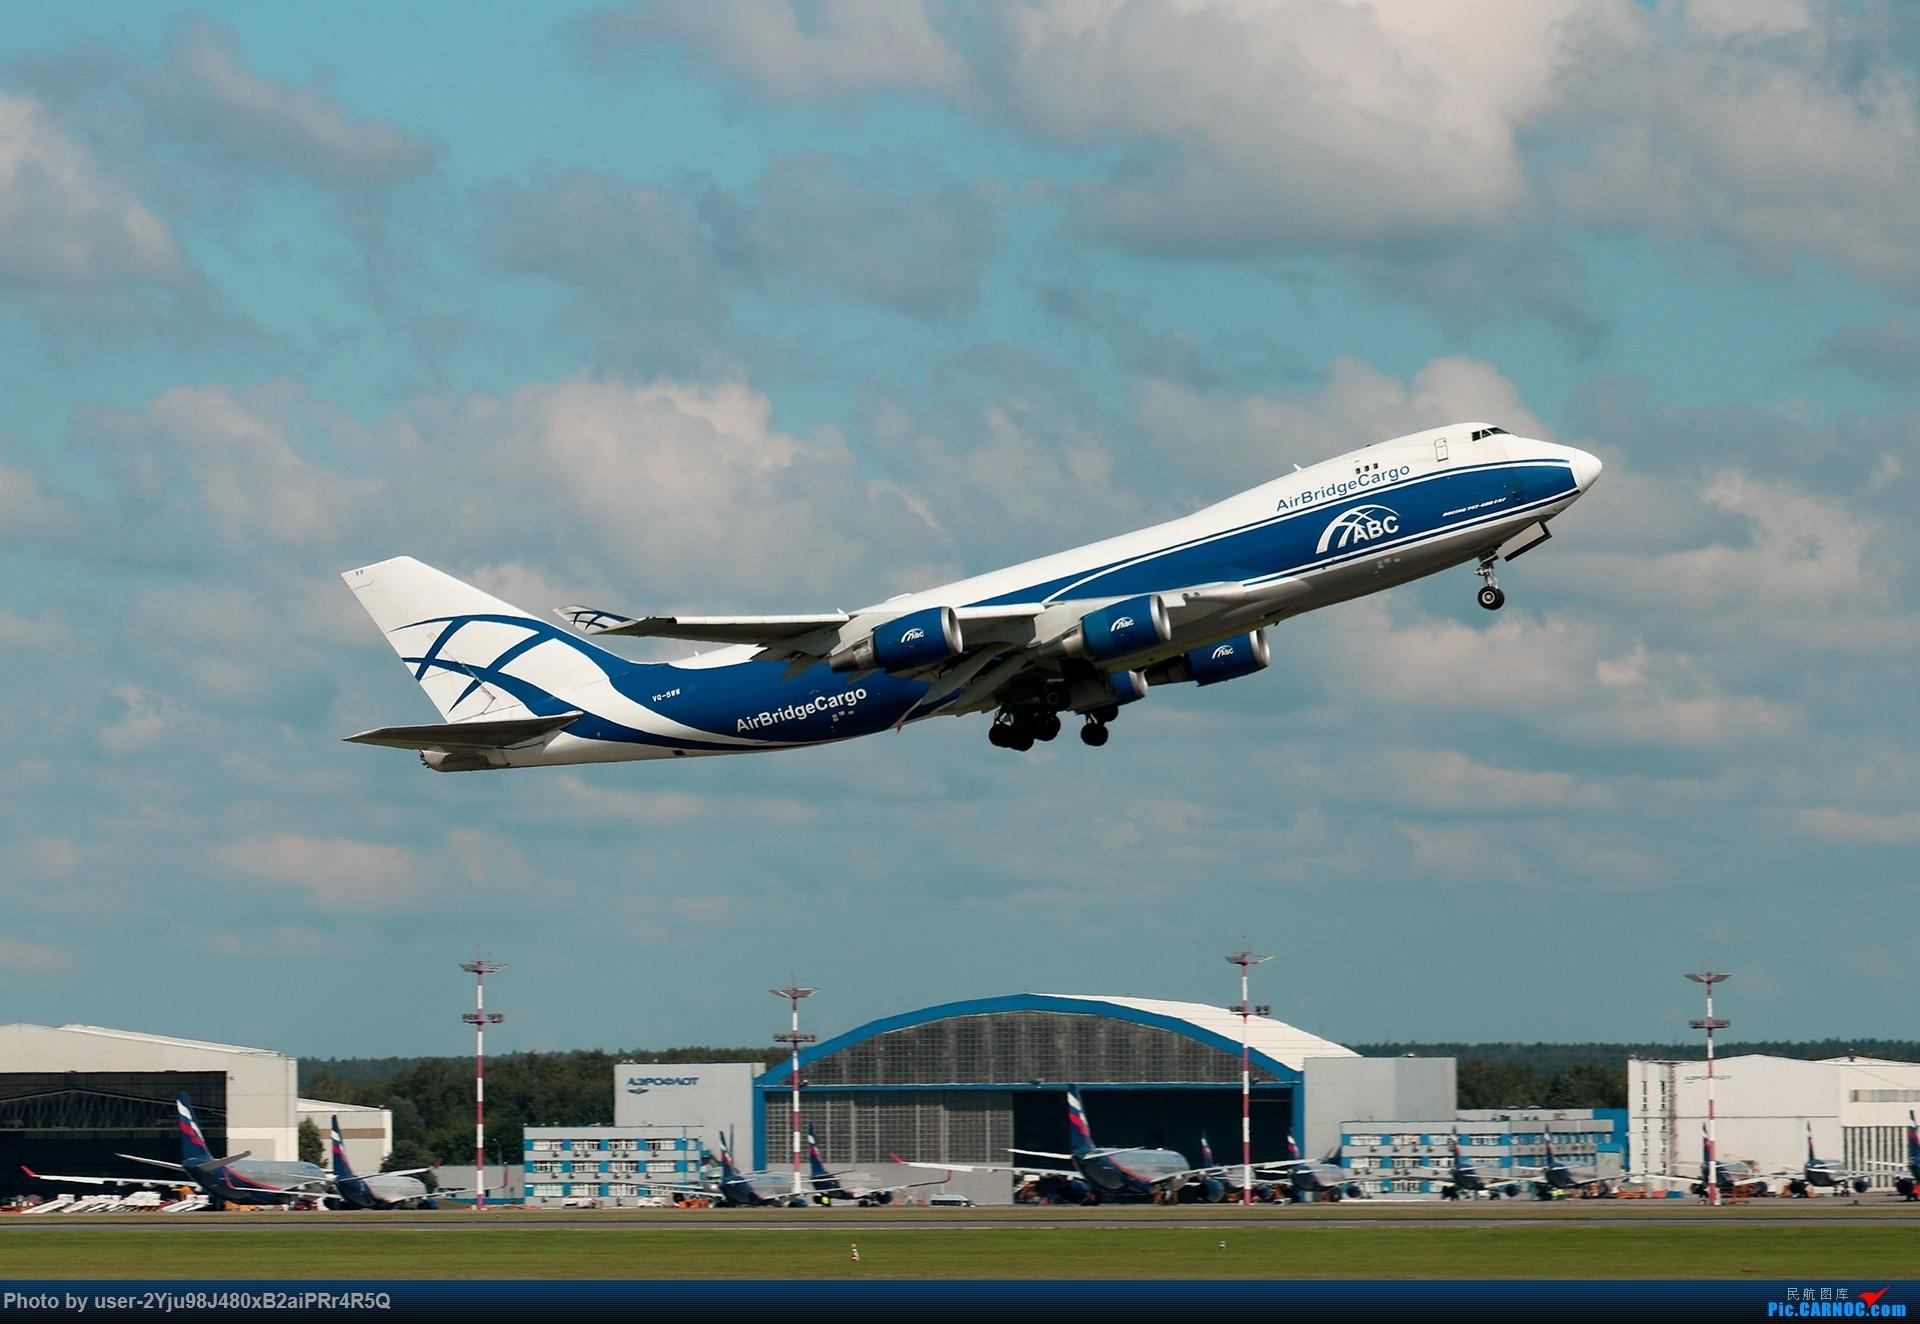 Re:[原创]LIULIU|Sheremetyevo的漫游|俄罗斯空桥货运 BOEING 747-406F(ER) VQ-BWW 俄罗斯谢诺梅杰沃机场